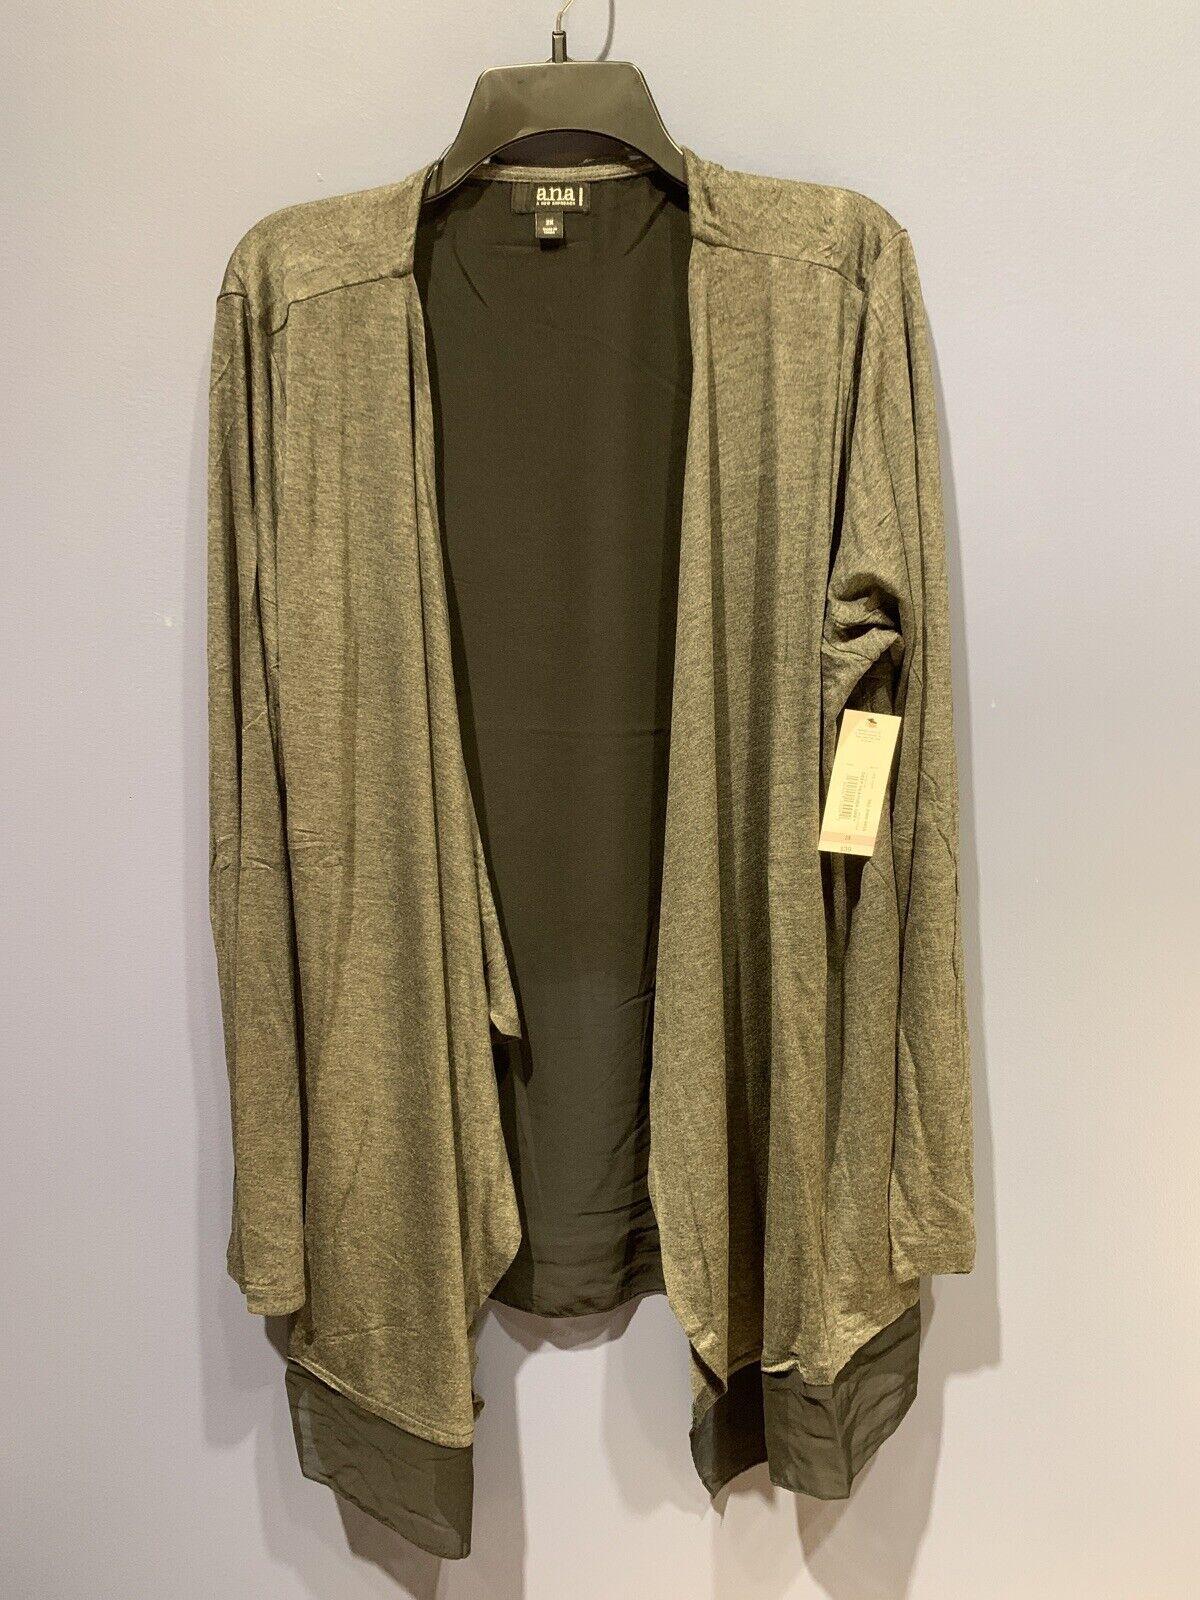 Womens 2X Jacket Cover, Dark Gray, Stretch, Handkerchief Bottom, A.N.A., NWT